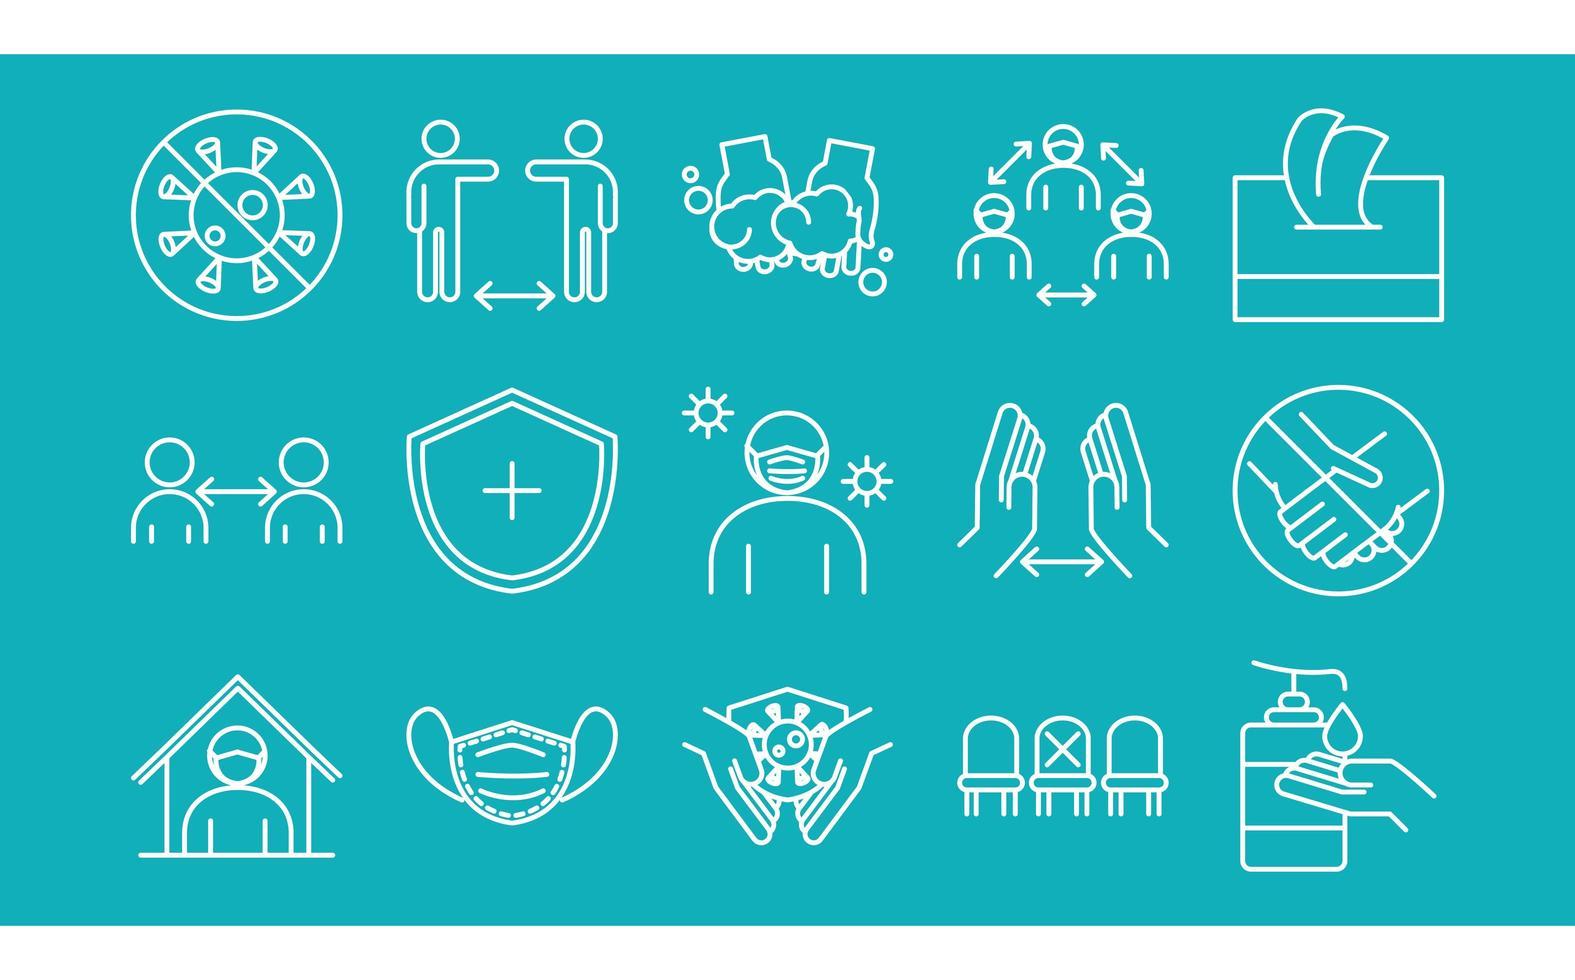 Coronavirus prevention pictogram icon set vector